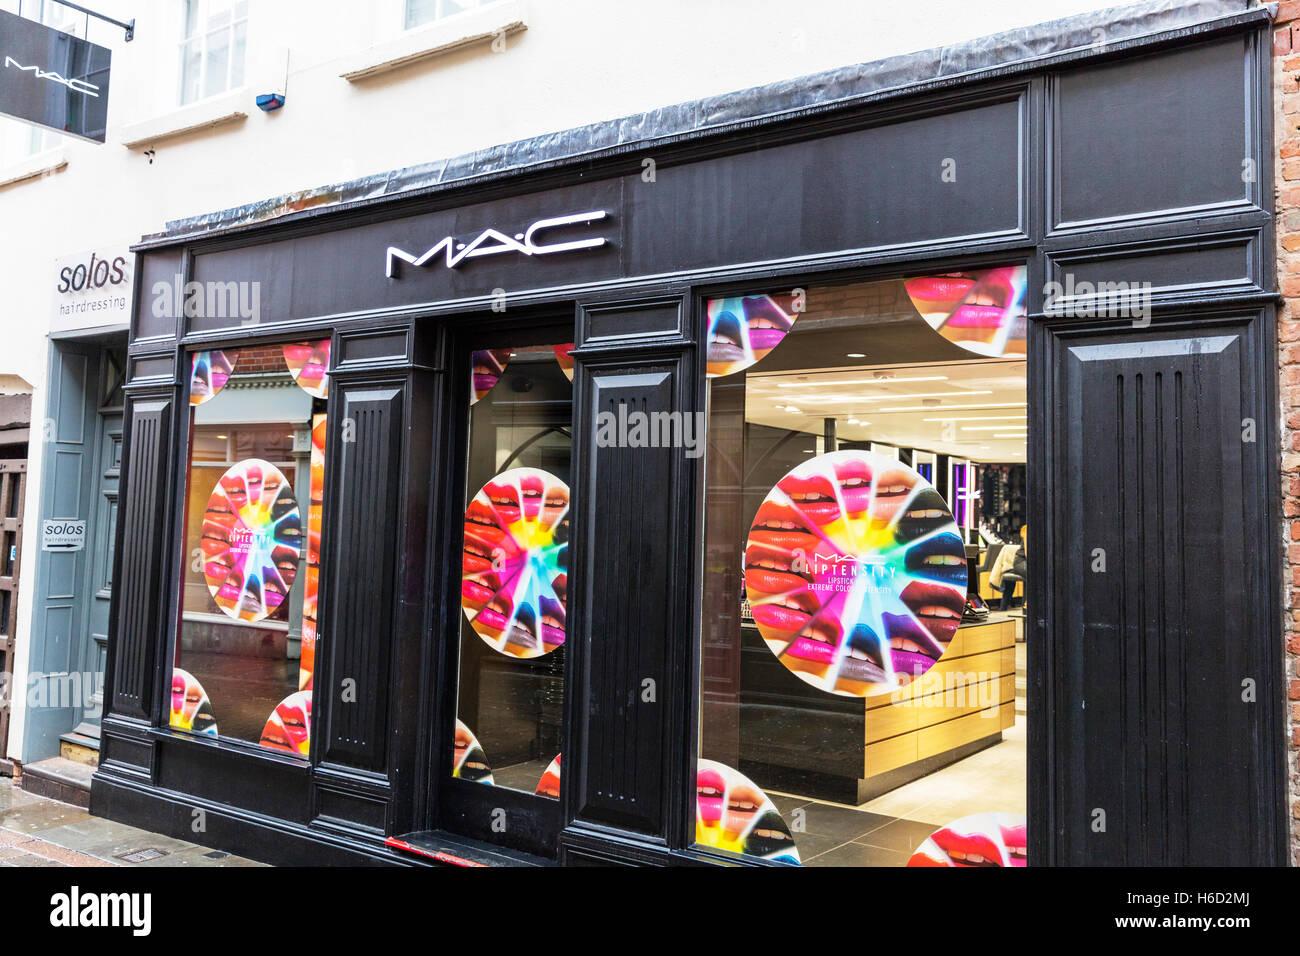 Mac Cosmetics Maquillaje Escaparates Signo Exterior